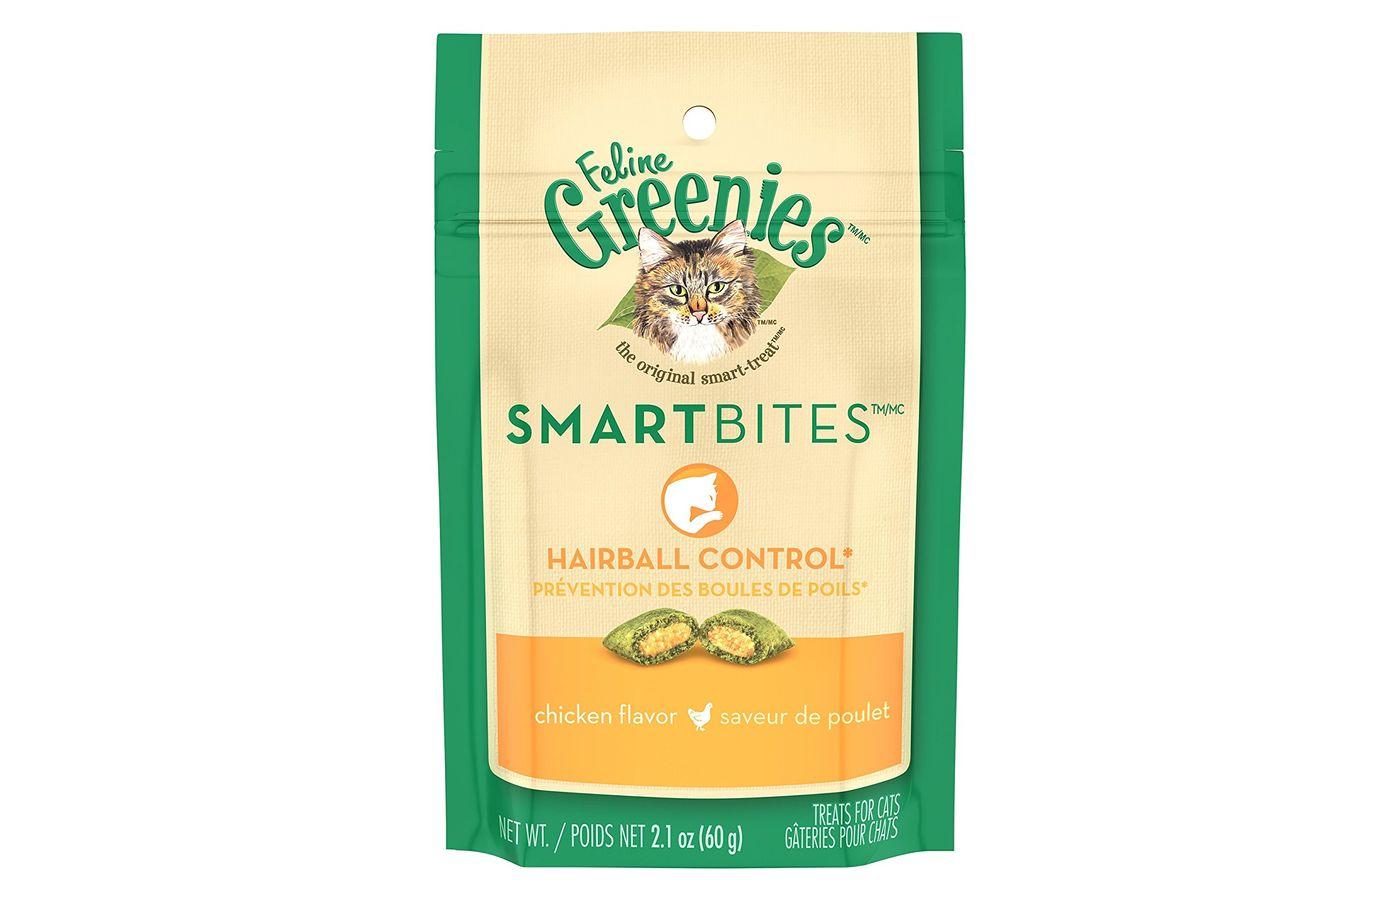 Greenies Smartbites Hairball Control